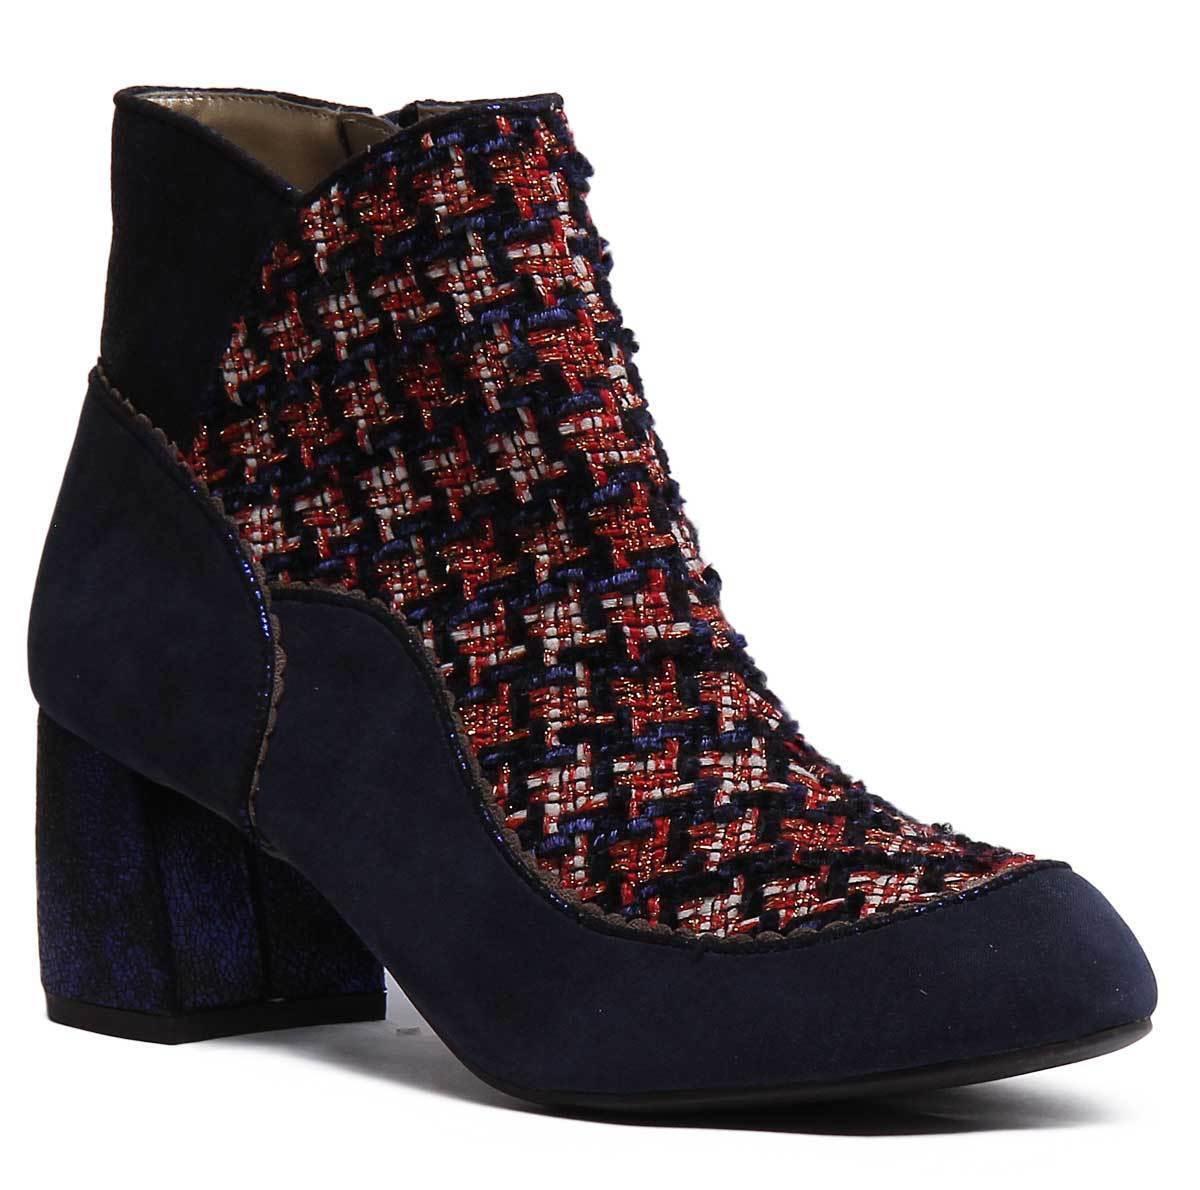 Ruby Ruby Ruby SHOO Karolina Mujeres Imitación Gamuza Tweed Azul Marino botas al tobillo 086592